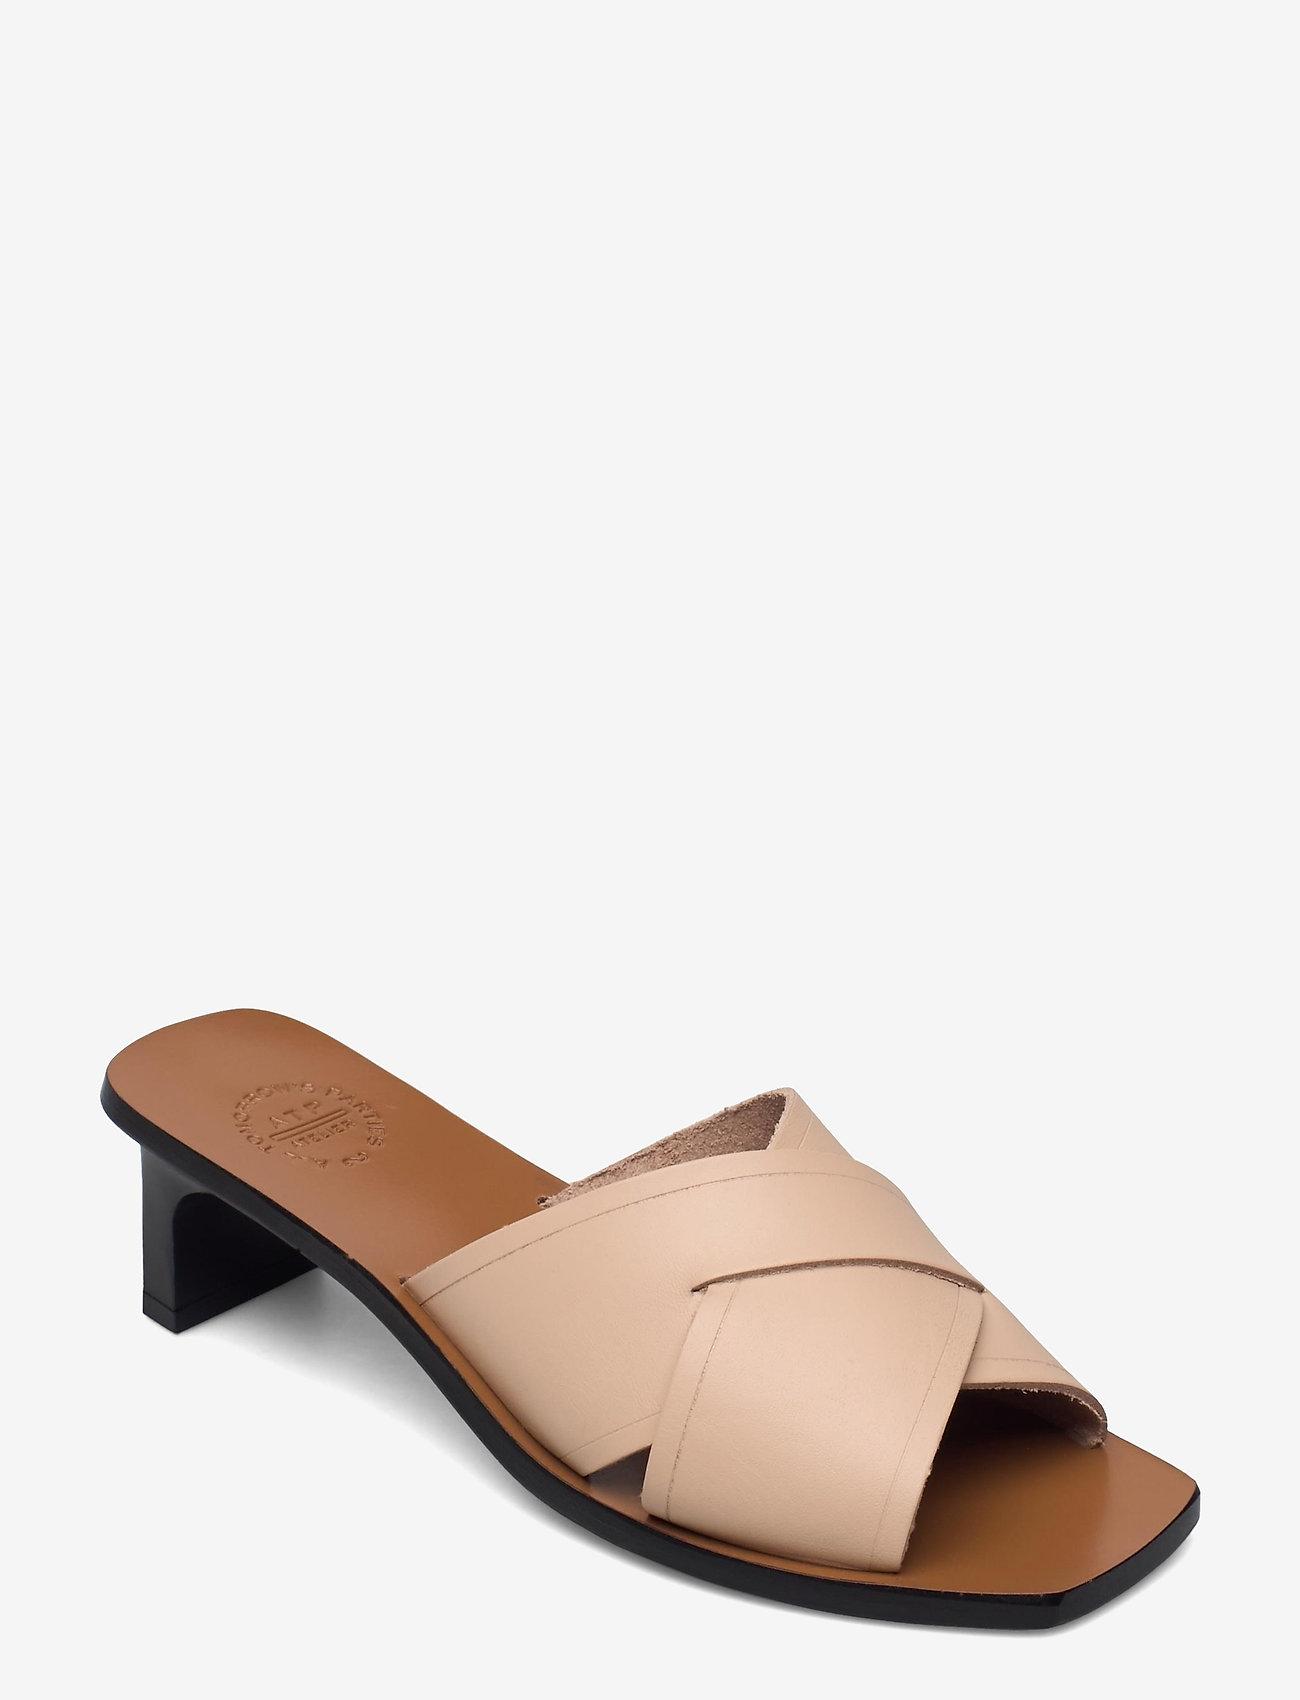 ATP Atelier - Stornarella Sand Vacchetta - heeled sandals - sand - 0